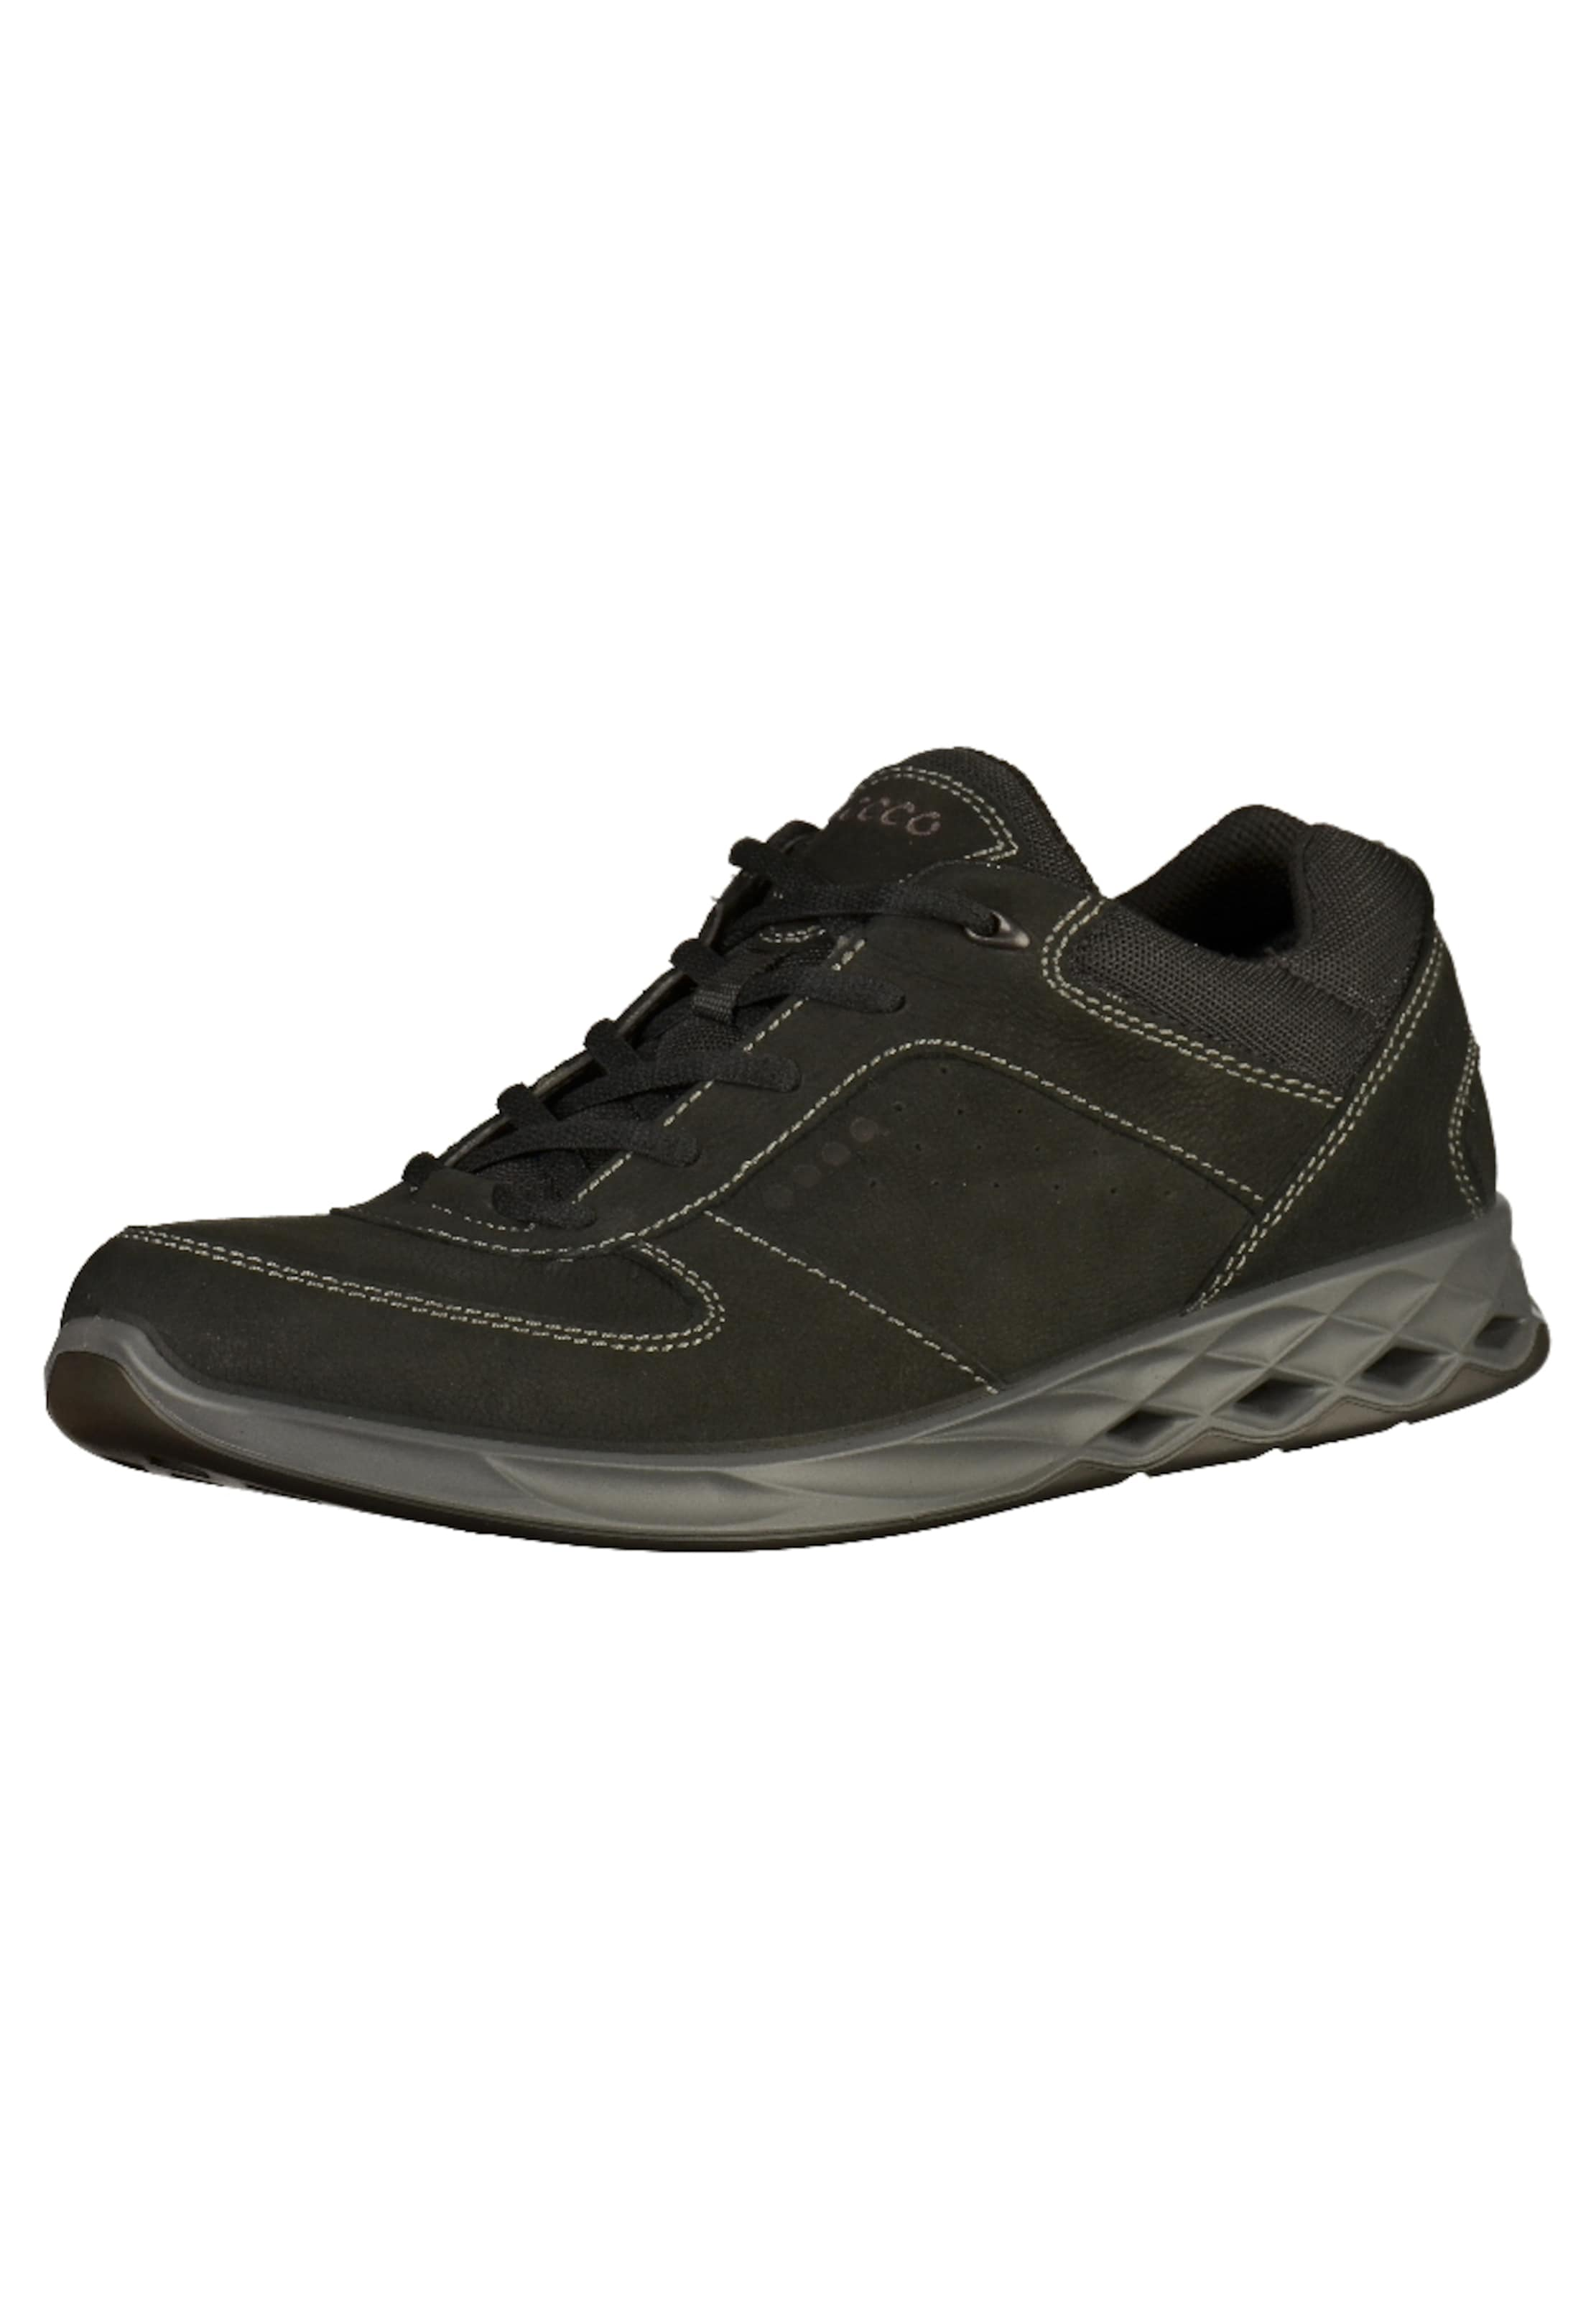 Haltbare Mode billige Schuhe ECCO | Sneaker Schuhe Gut getragene Schuhe